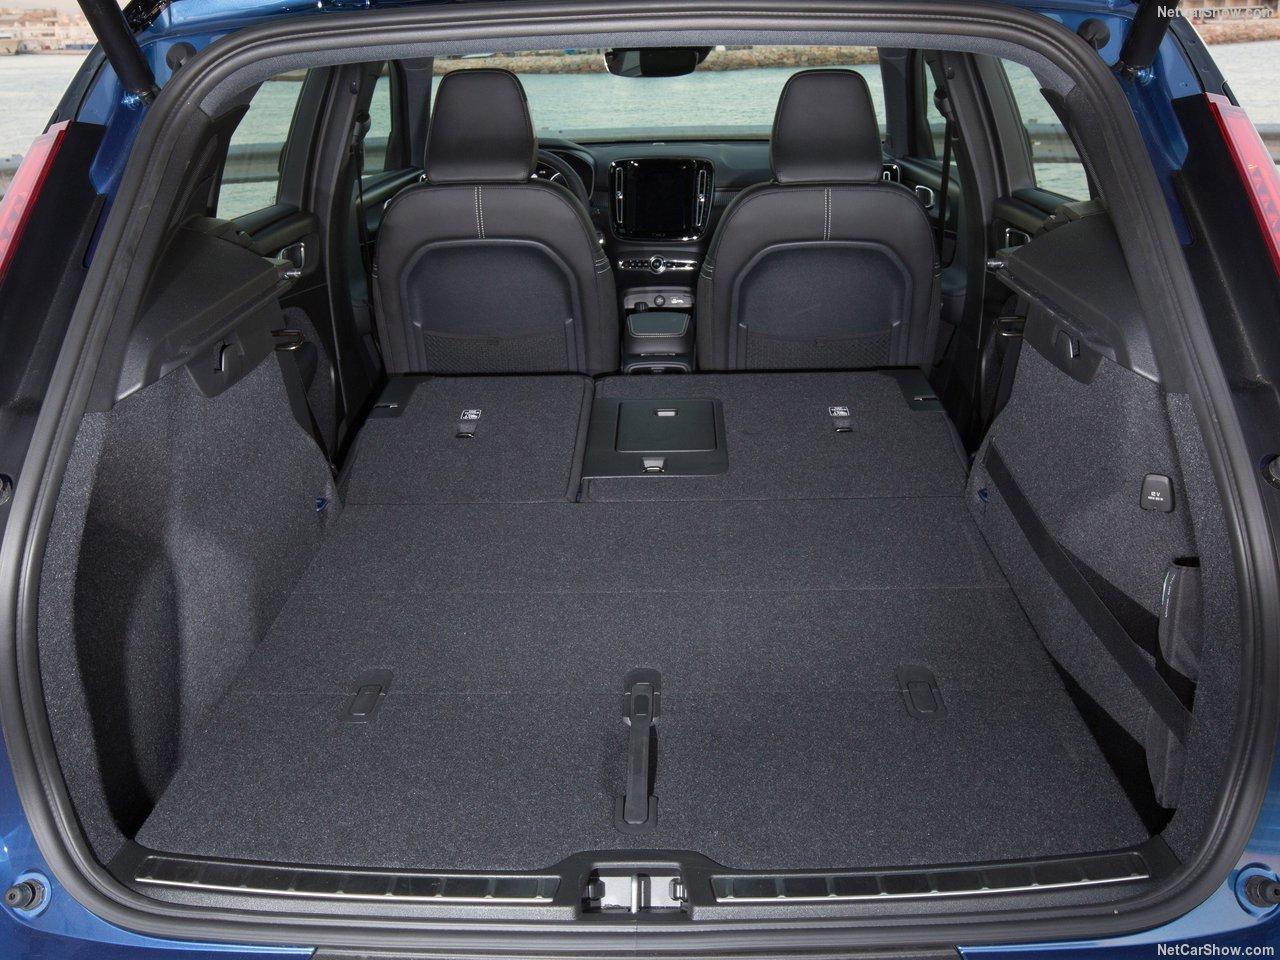 Volvo-XC40-2018-1280-83.jpg